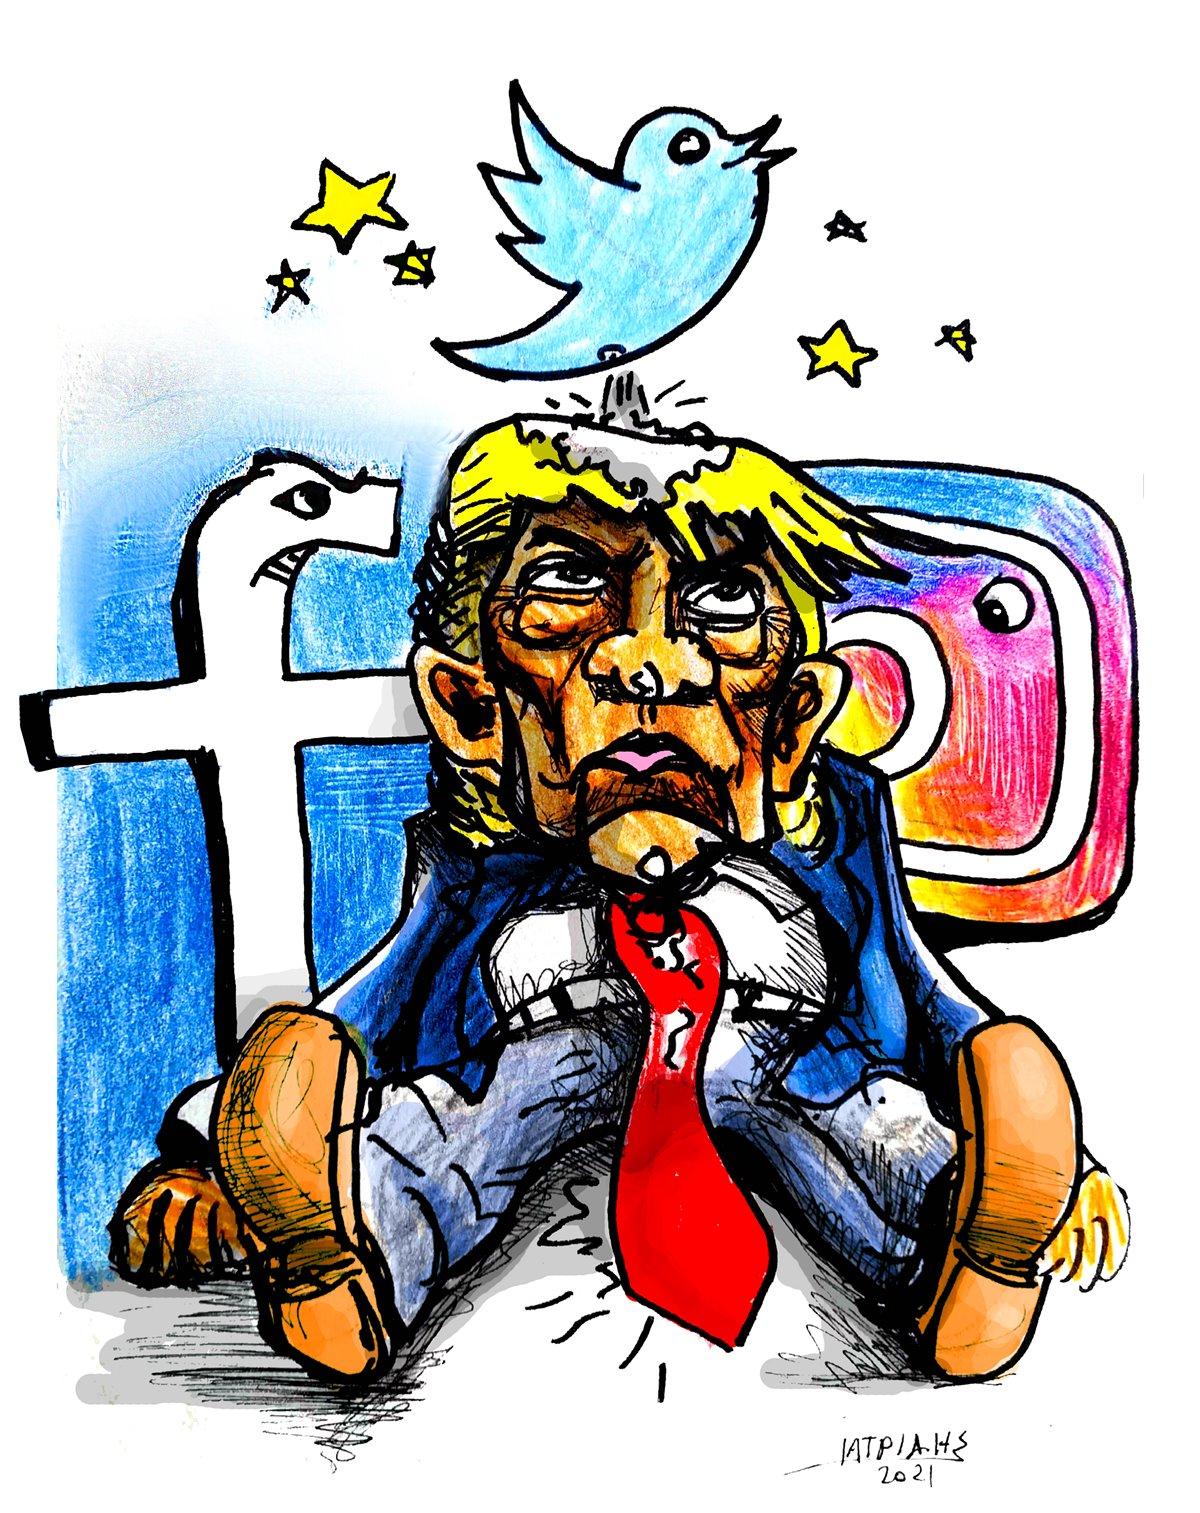 ta mesa koinwnikis diktiwsis mplokaran ton proedro ntonalnt tramp ameriki usa trump social media intagram facebook twitter myxalandri iatridis geloiografia